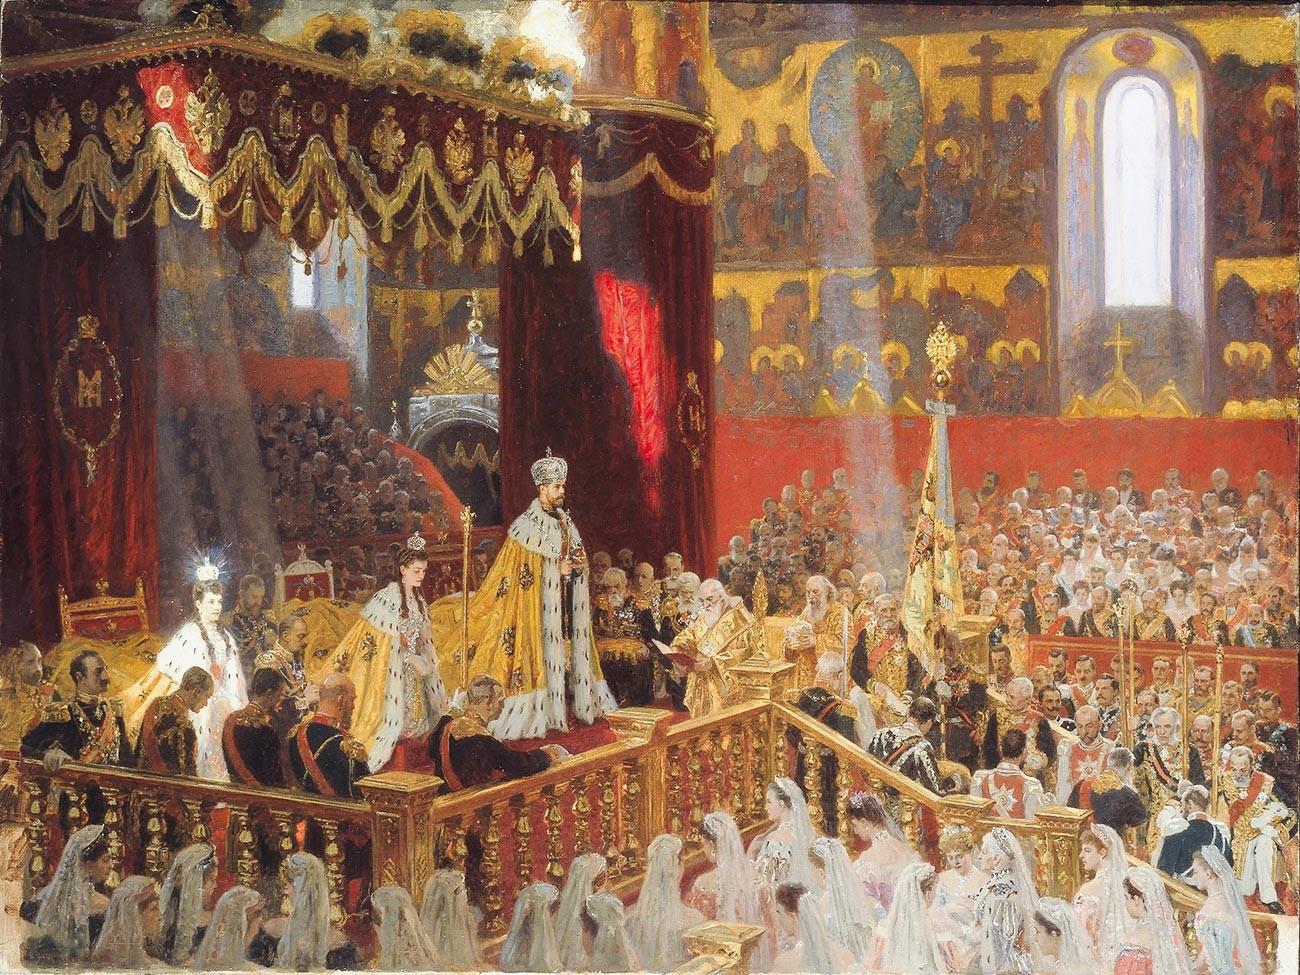 Krunidba Nikolaja II. u Uspenskom saboru Moskovskog Kremlja.